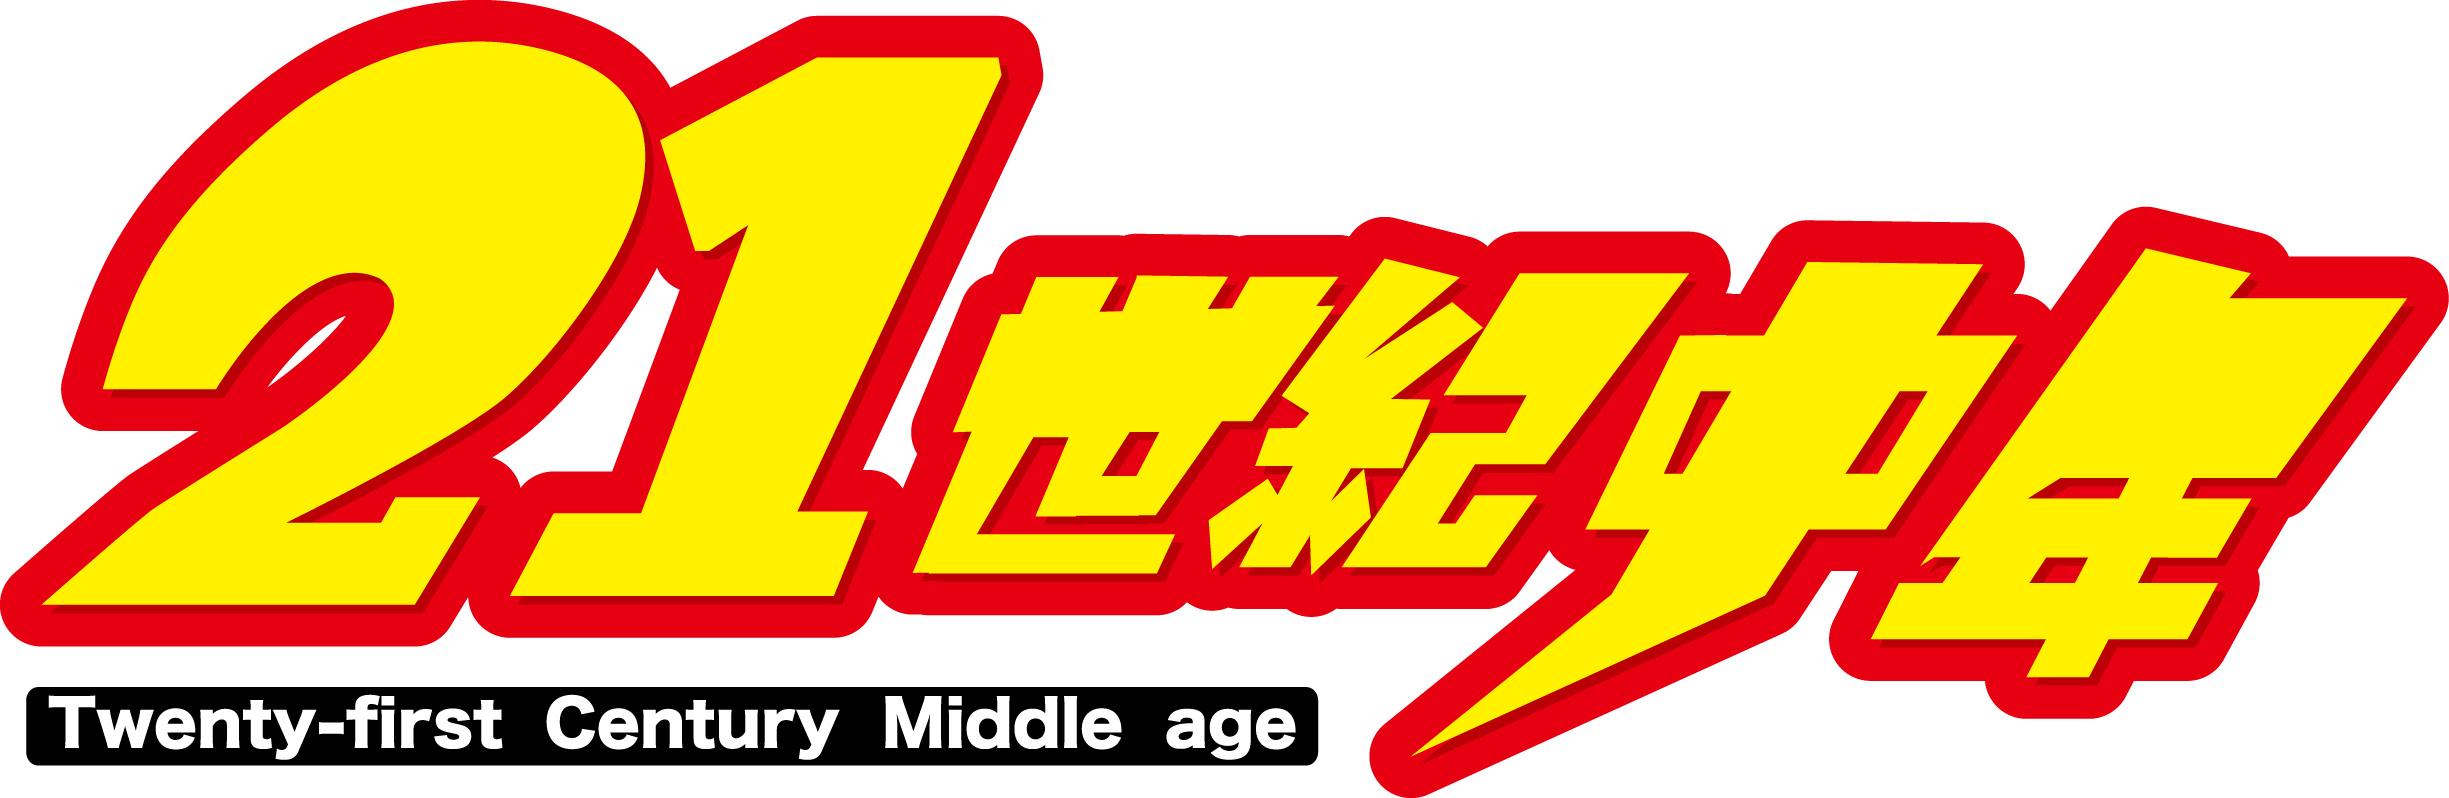 21st Century Middle age_f0011179_12403354.jpg